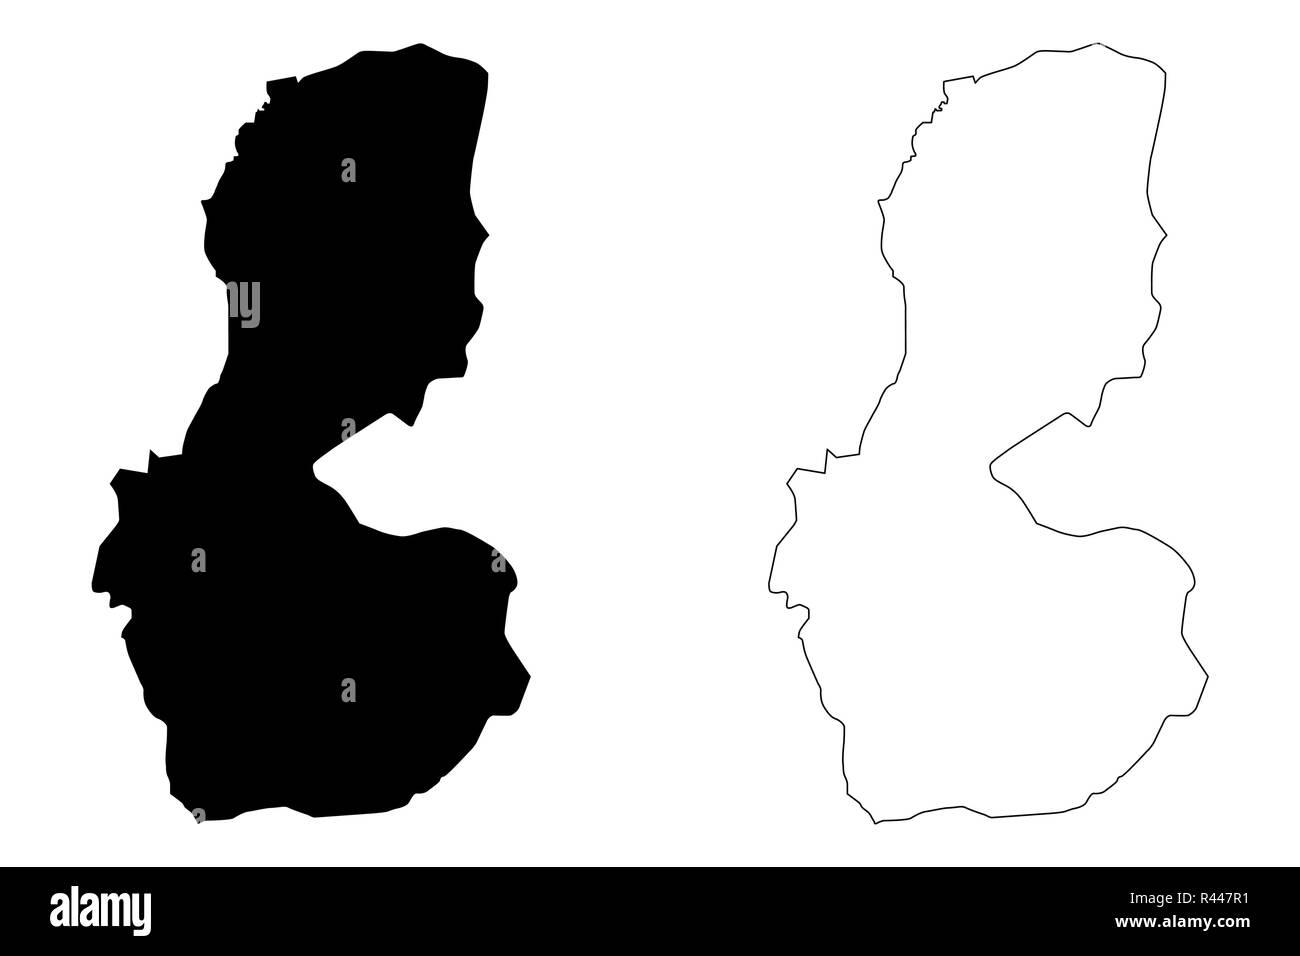 Batman (Provinces of the Republic of Turkey) map vector illustration, scribble sketch Batman ili map - Stock Image